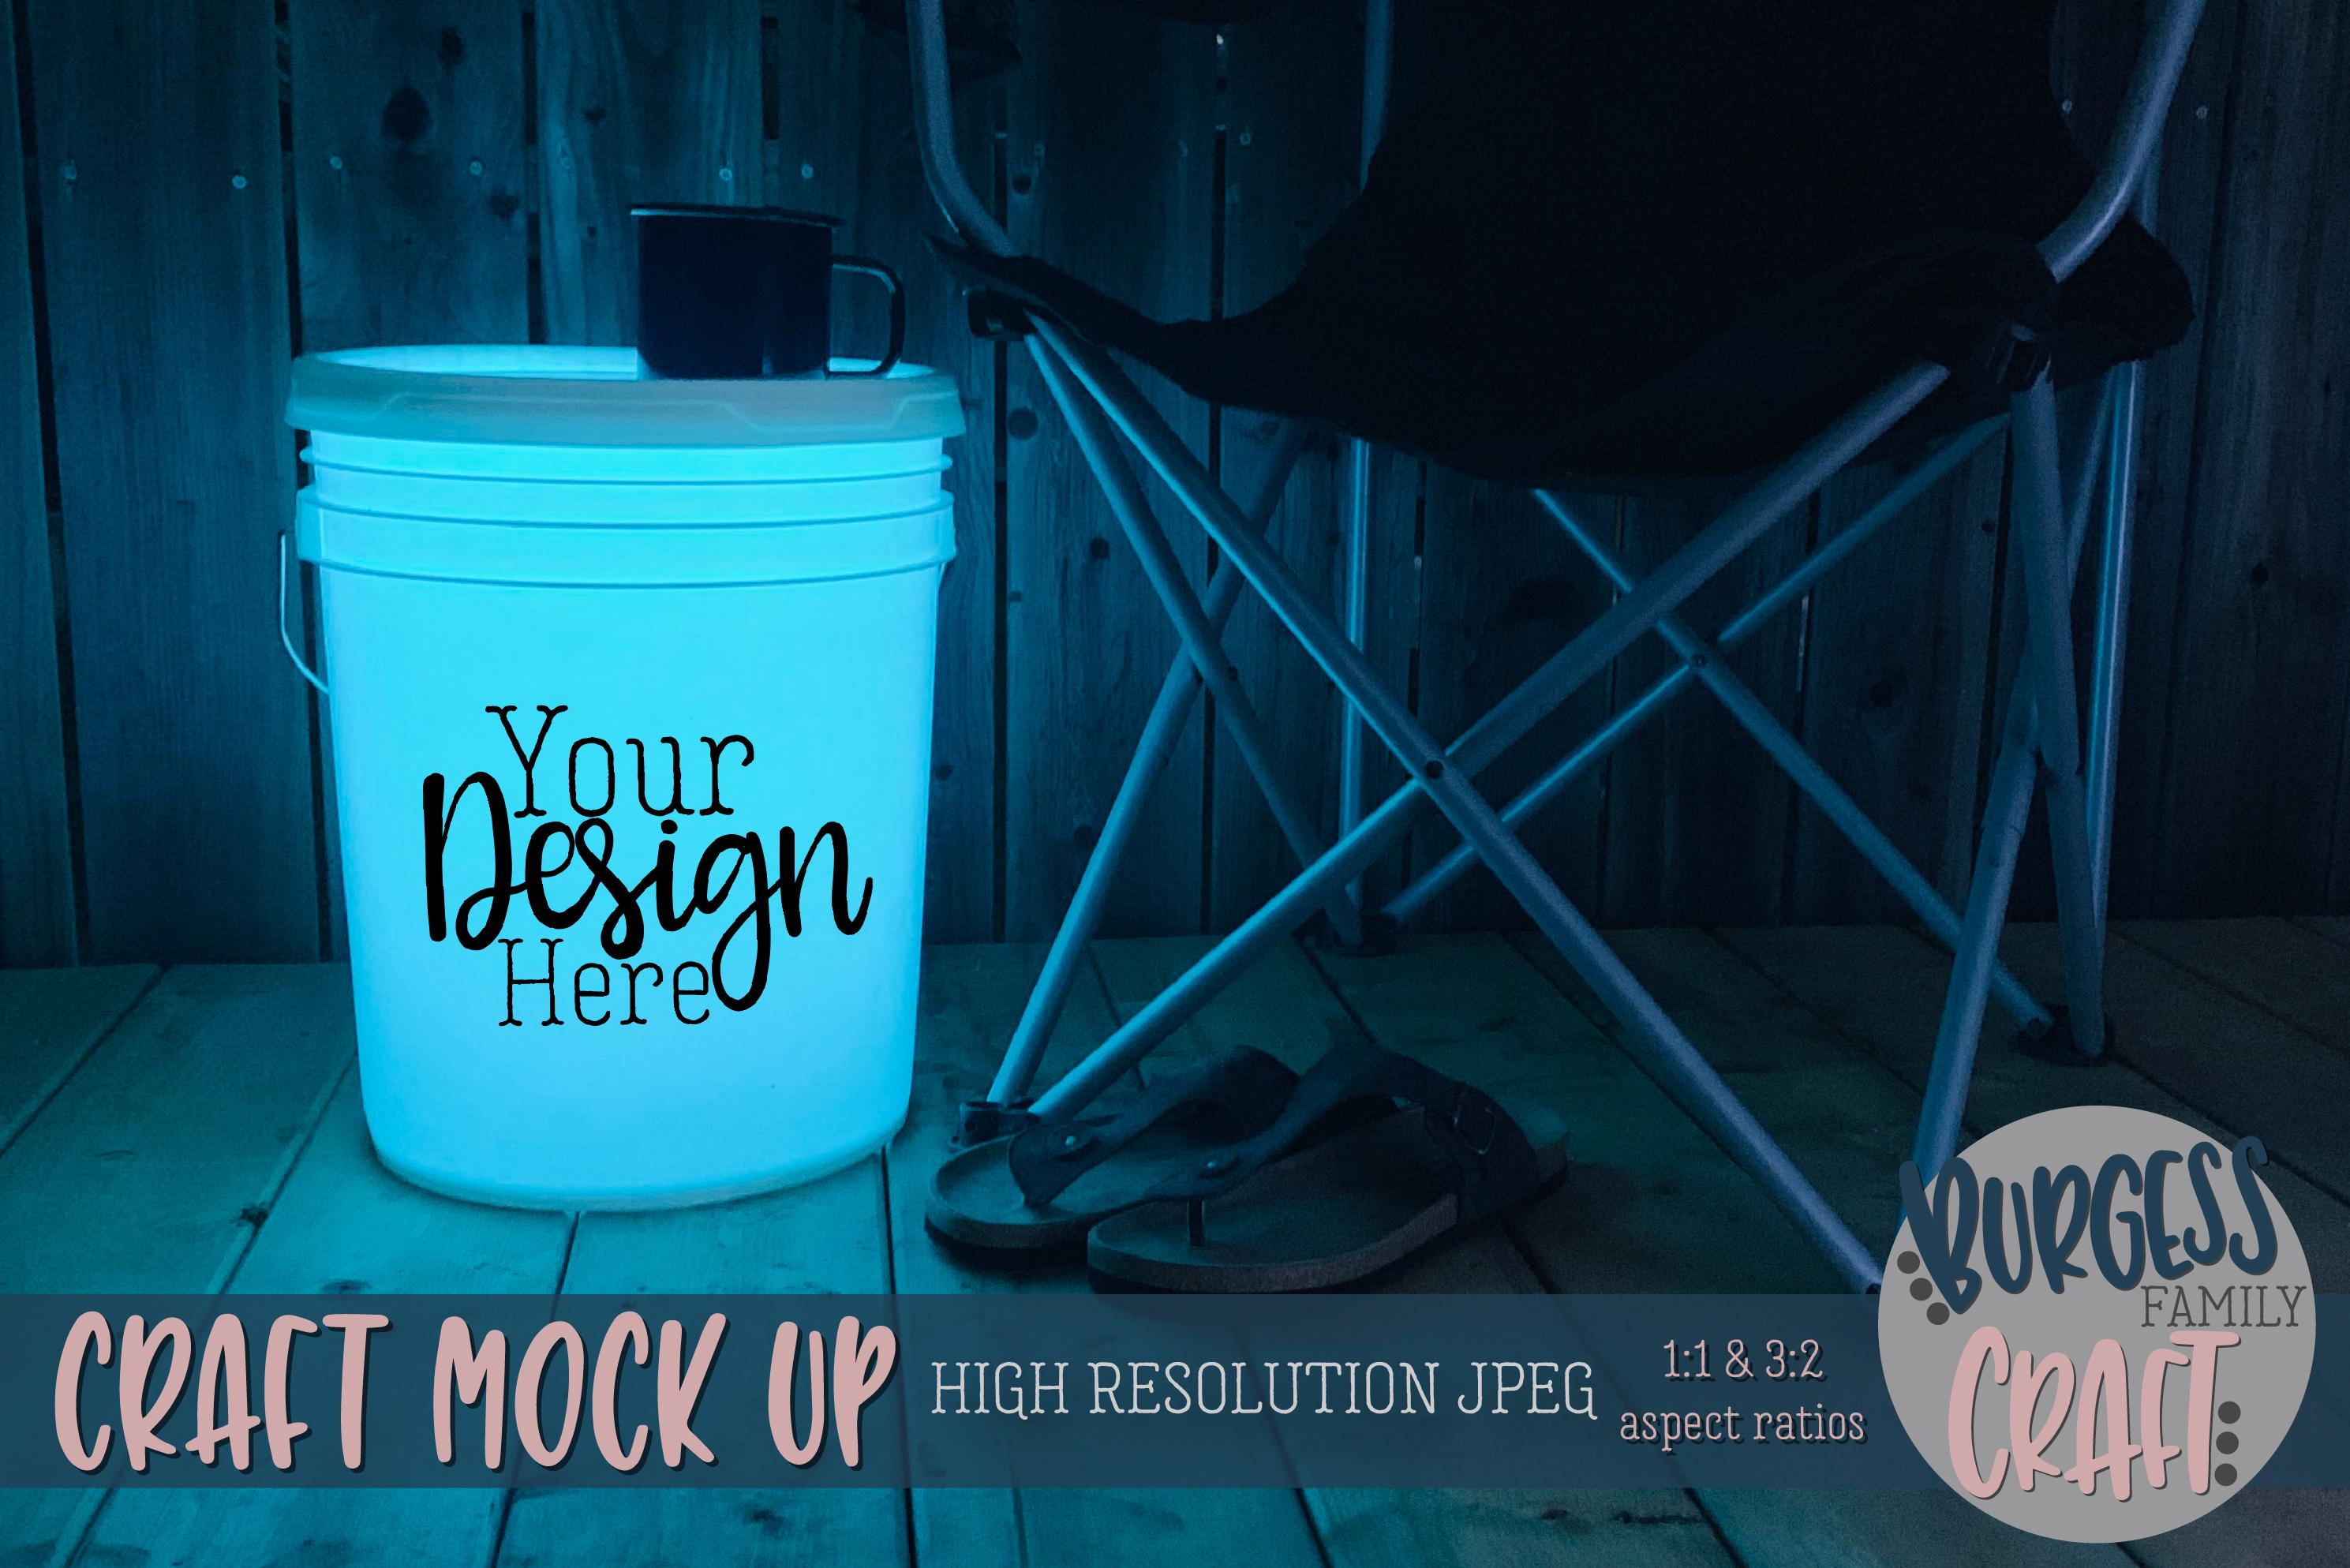 Bucket light table teal Craft mock up| High Resolution JPEG example image 1